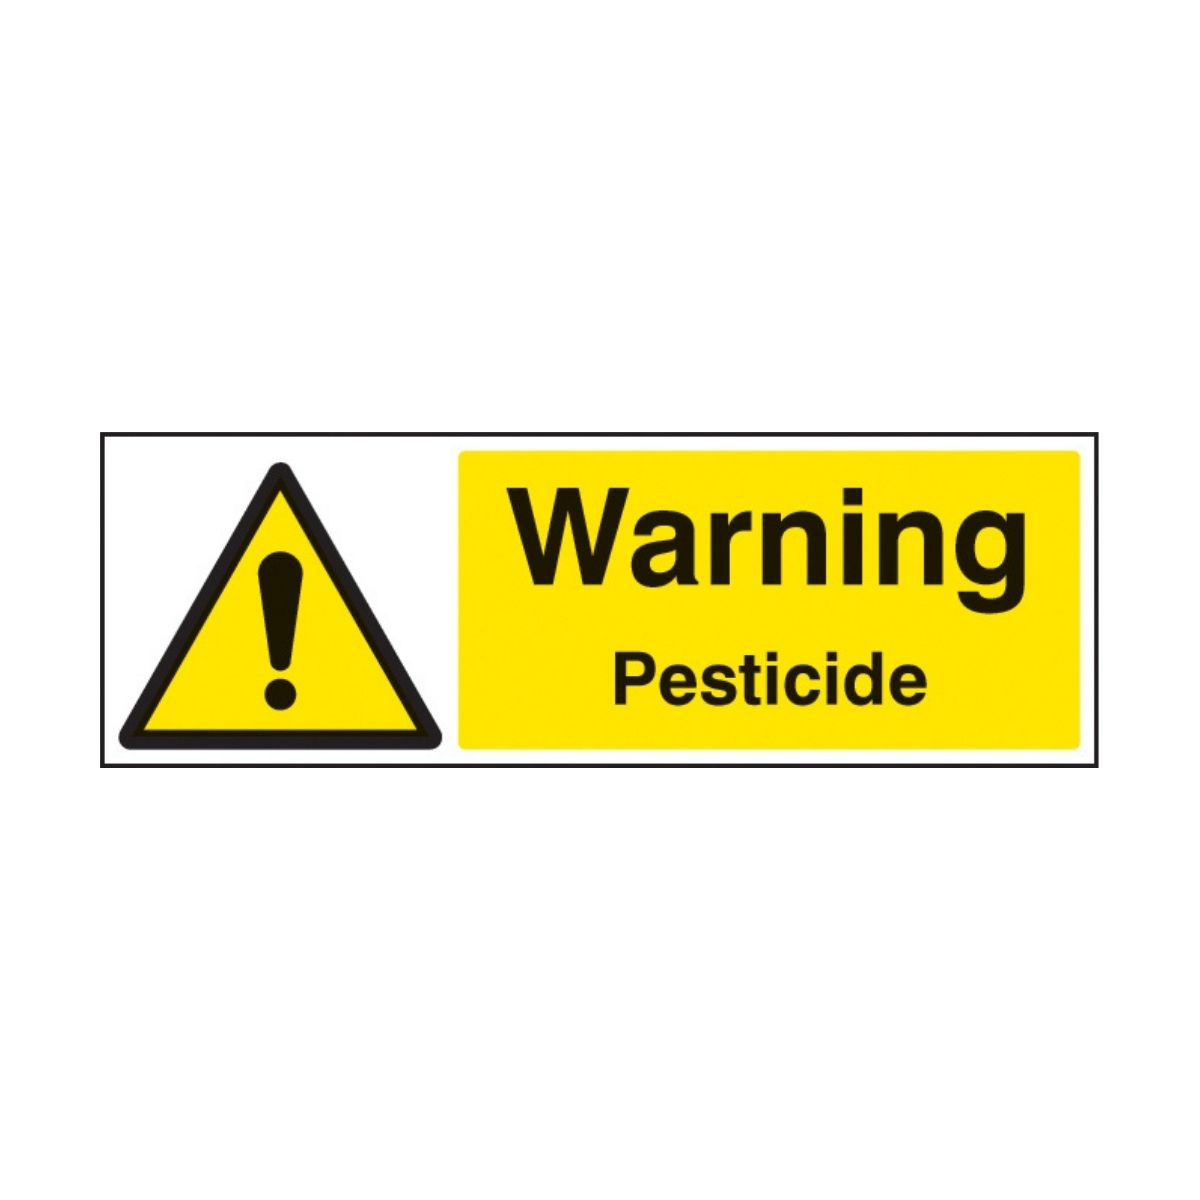 SS24457G Warning Pesticide (300 x 100mm)